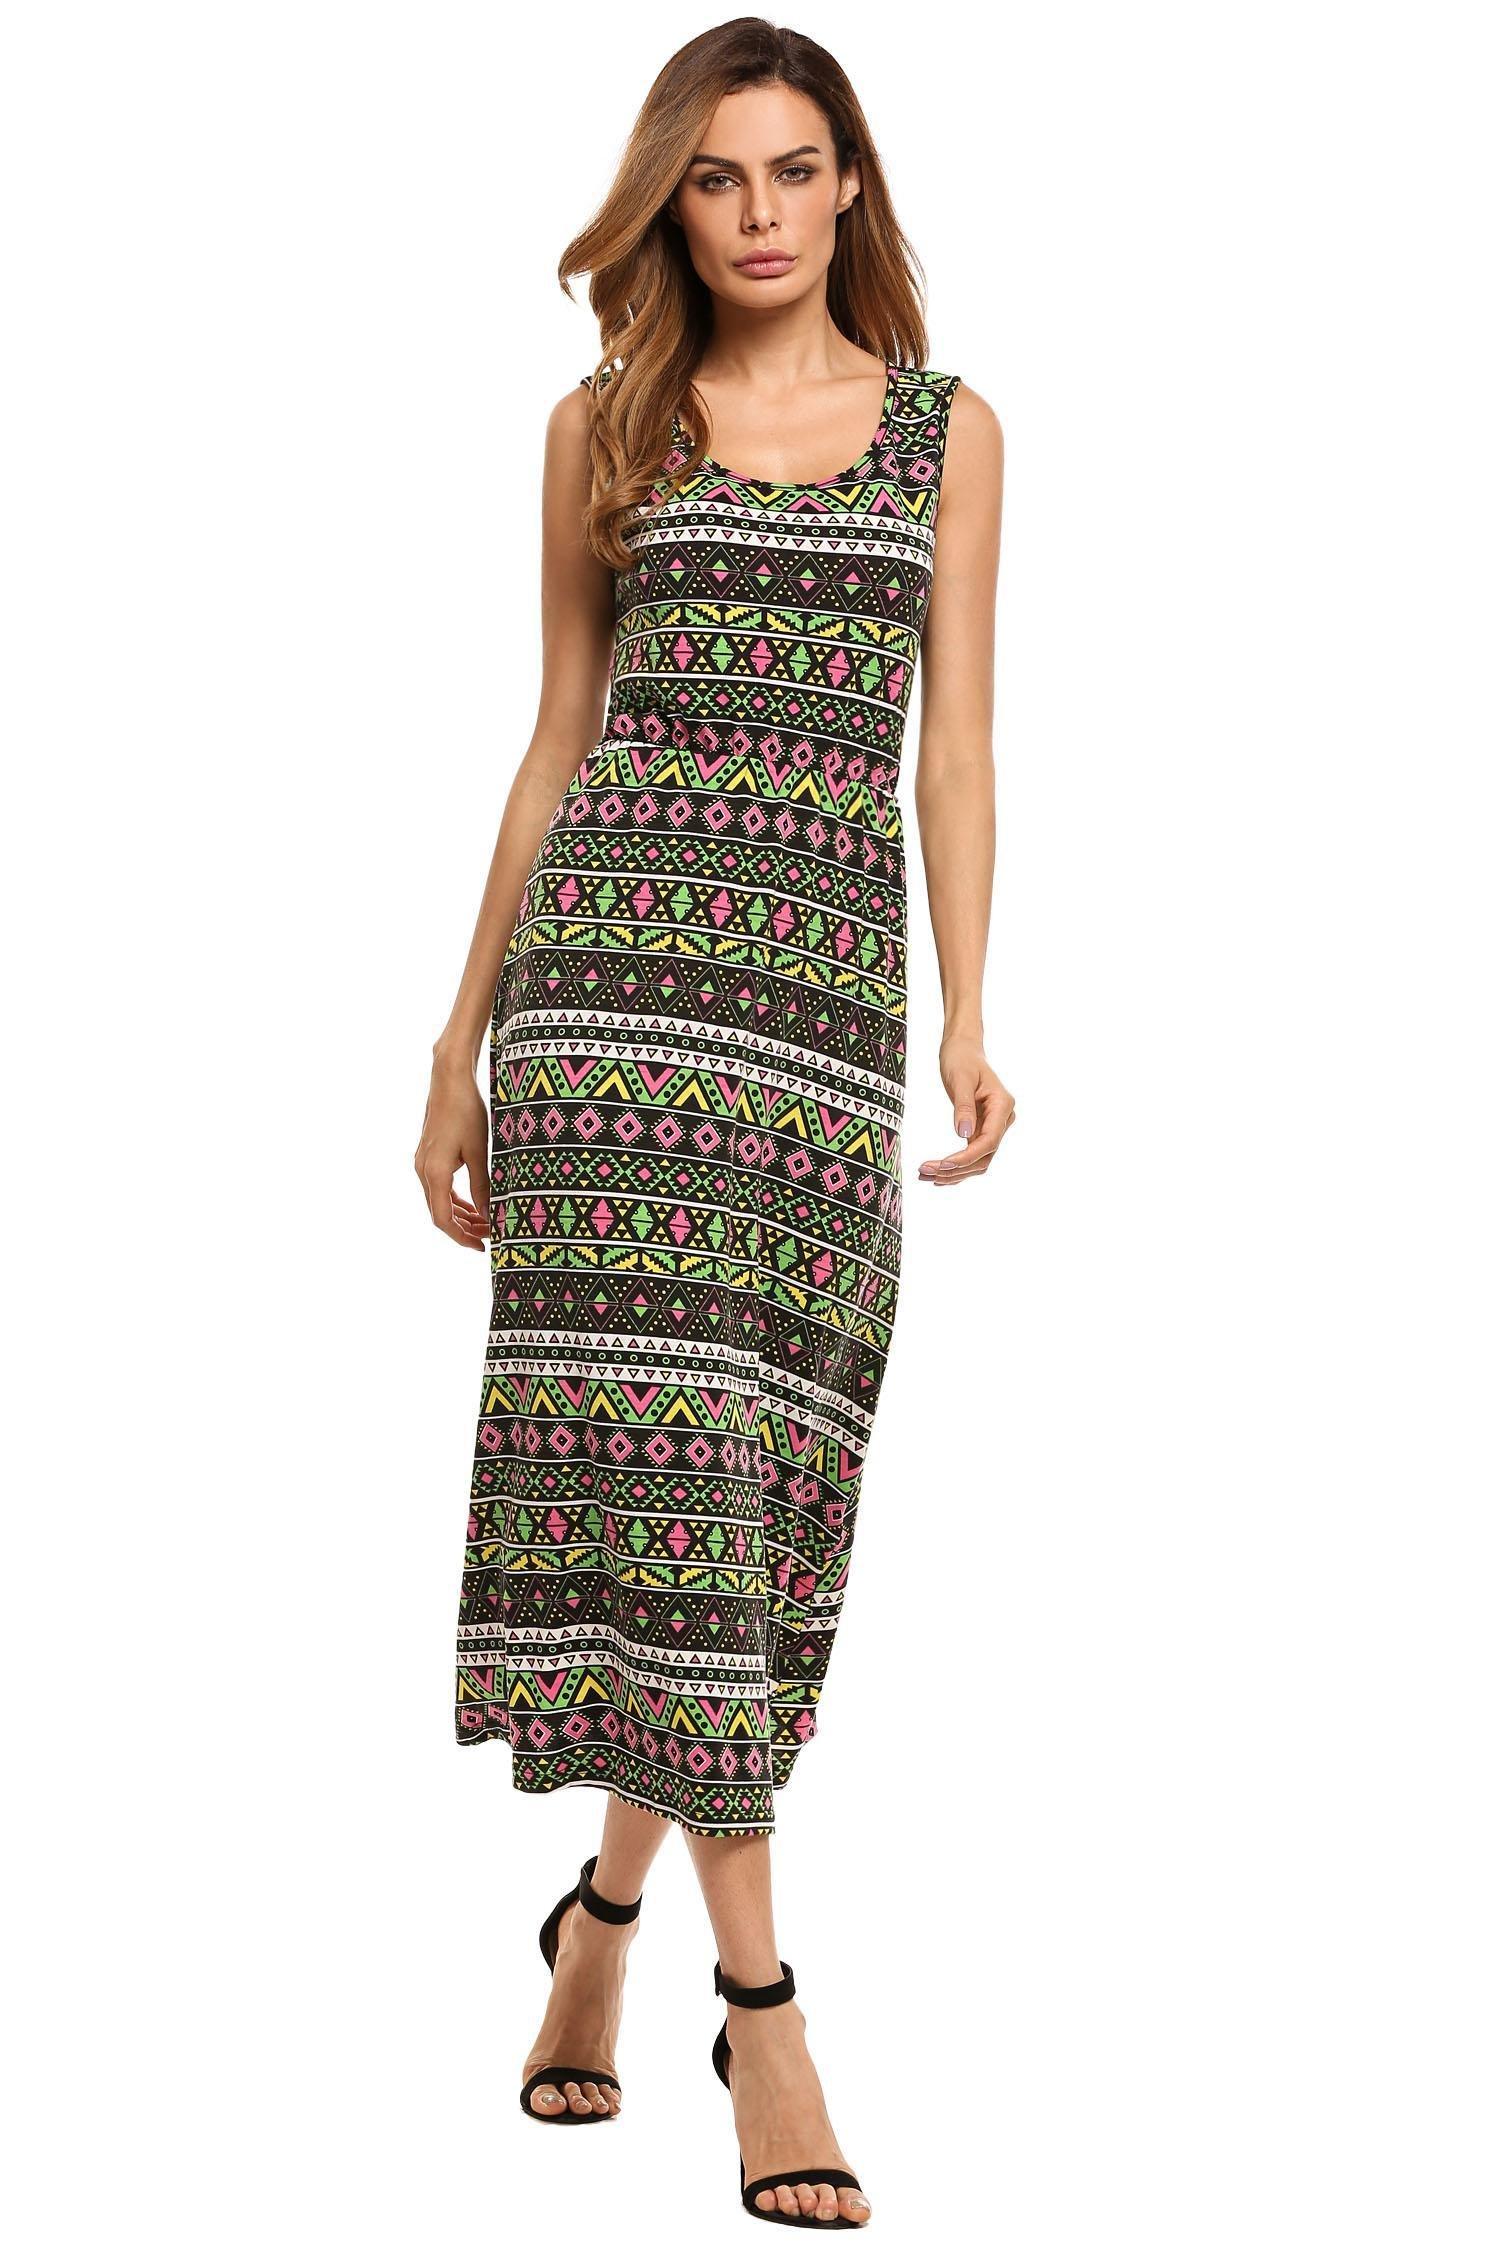 Zeagoo Women's Boho Sleeveless Sundress Casual Loose Vintage Print Maxi Tank Dress Green Small